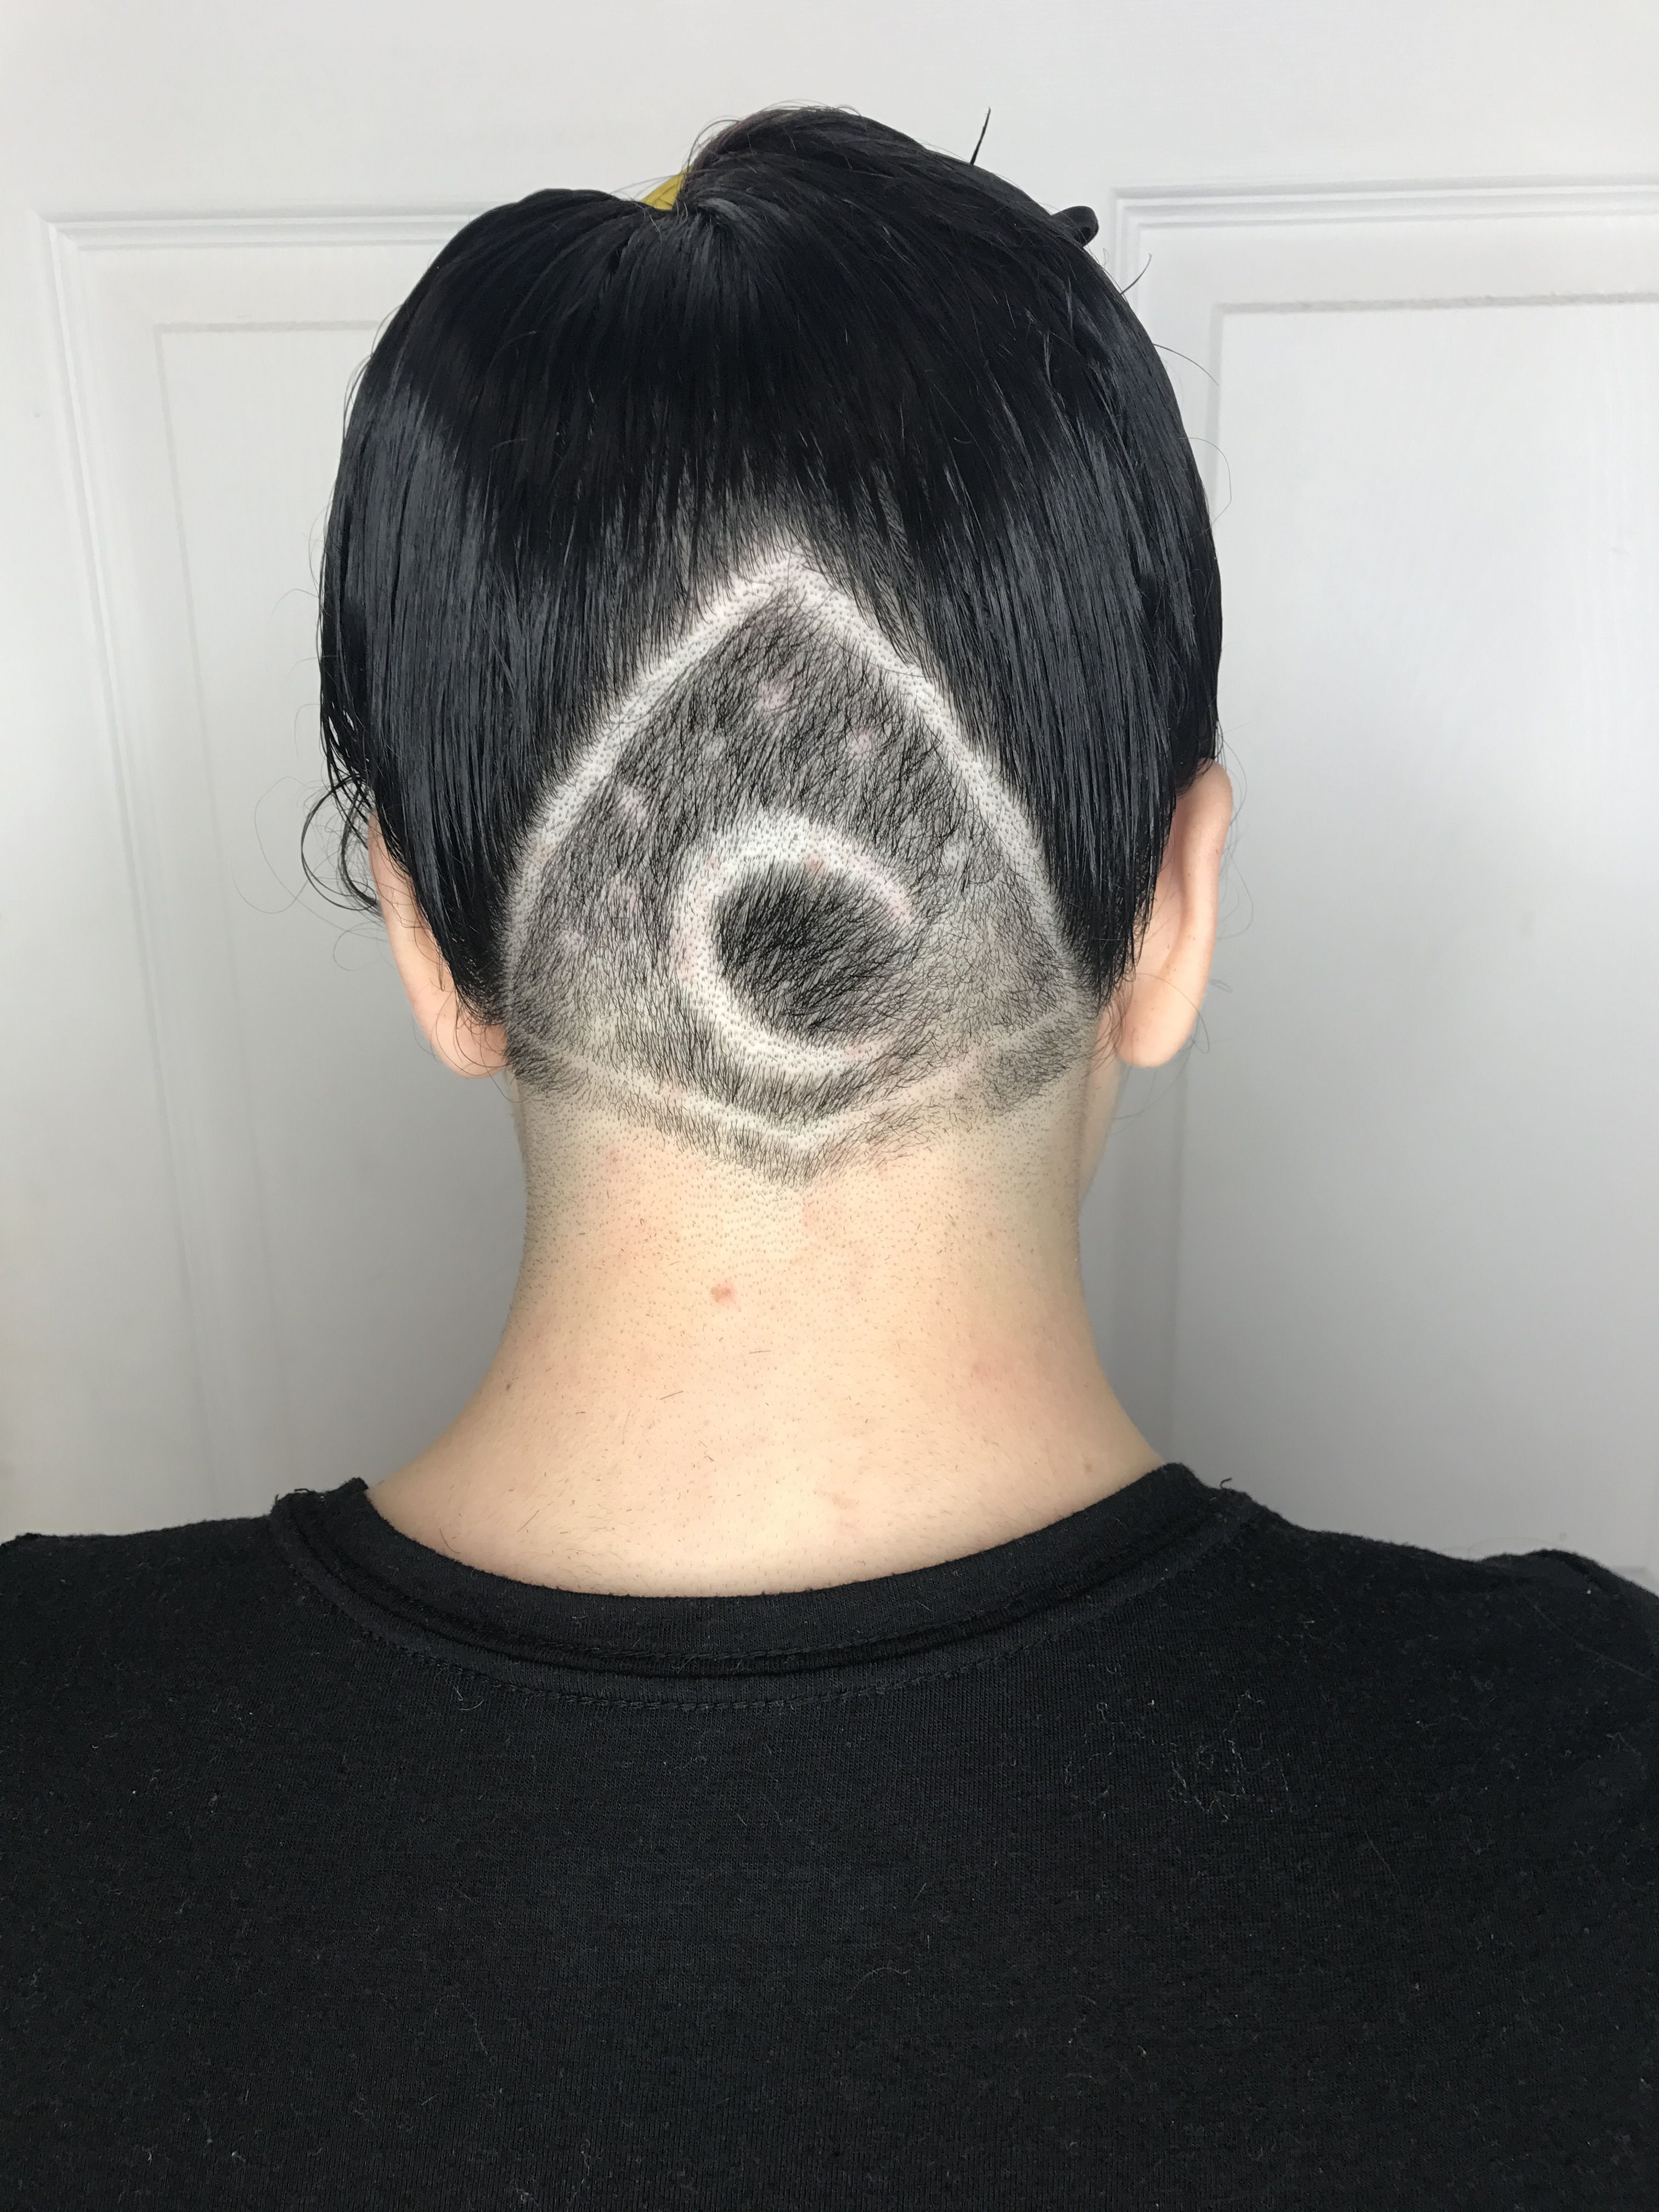 Crescent Moon Undercut Design Undercut Designs Undercut Undercut Hairstyles